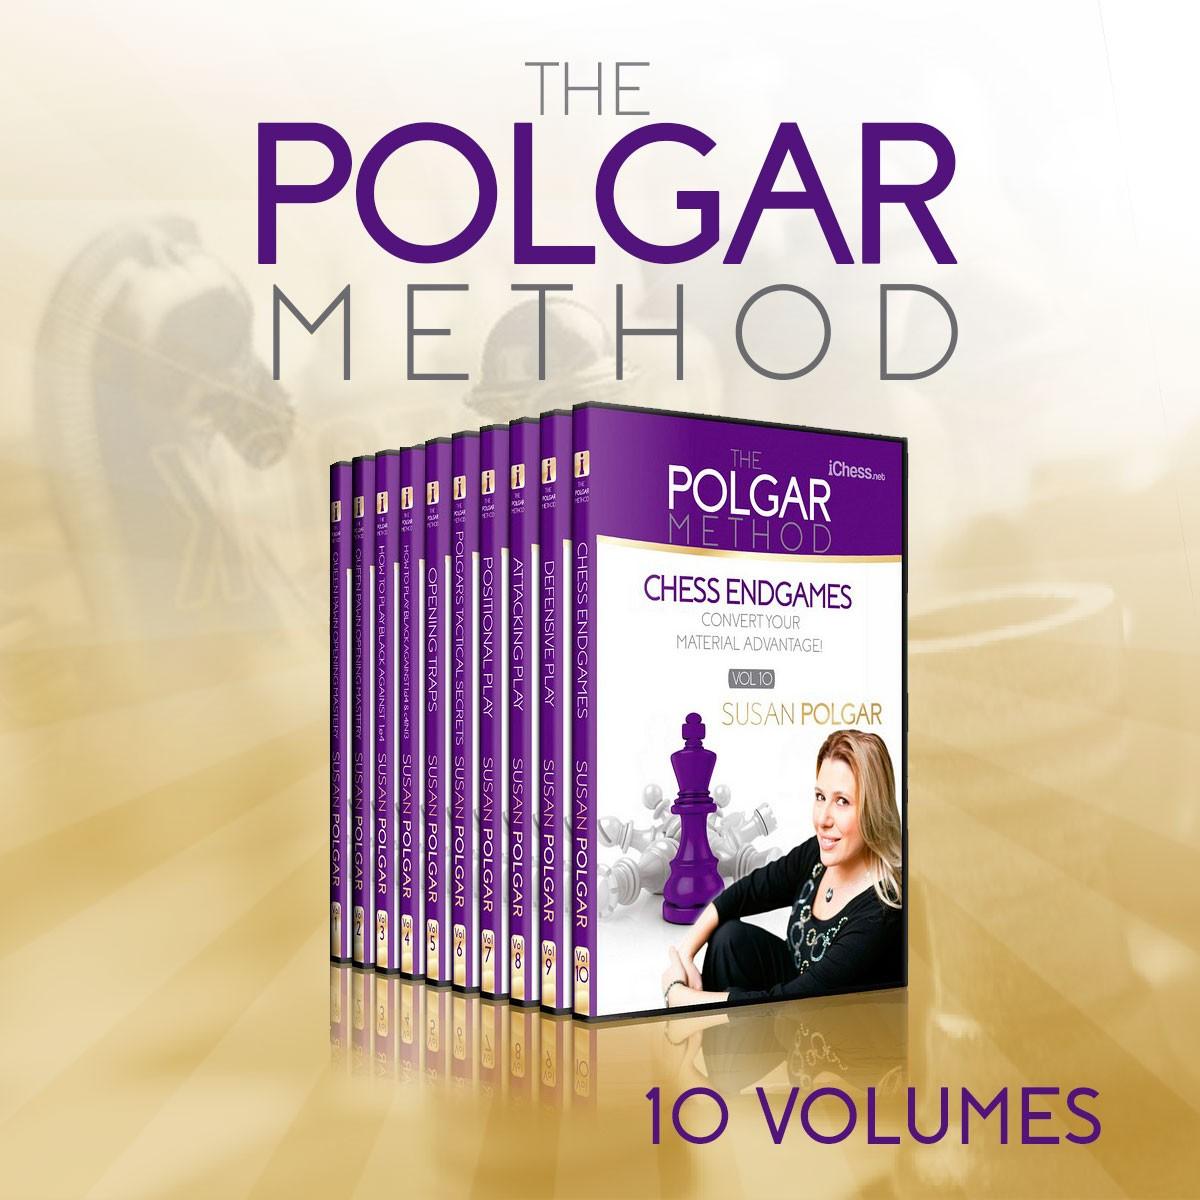 The Polgar Method - GM Susan Polgar's Complete Course for Club Players